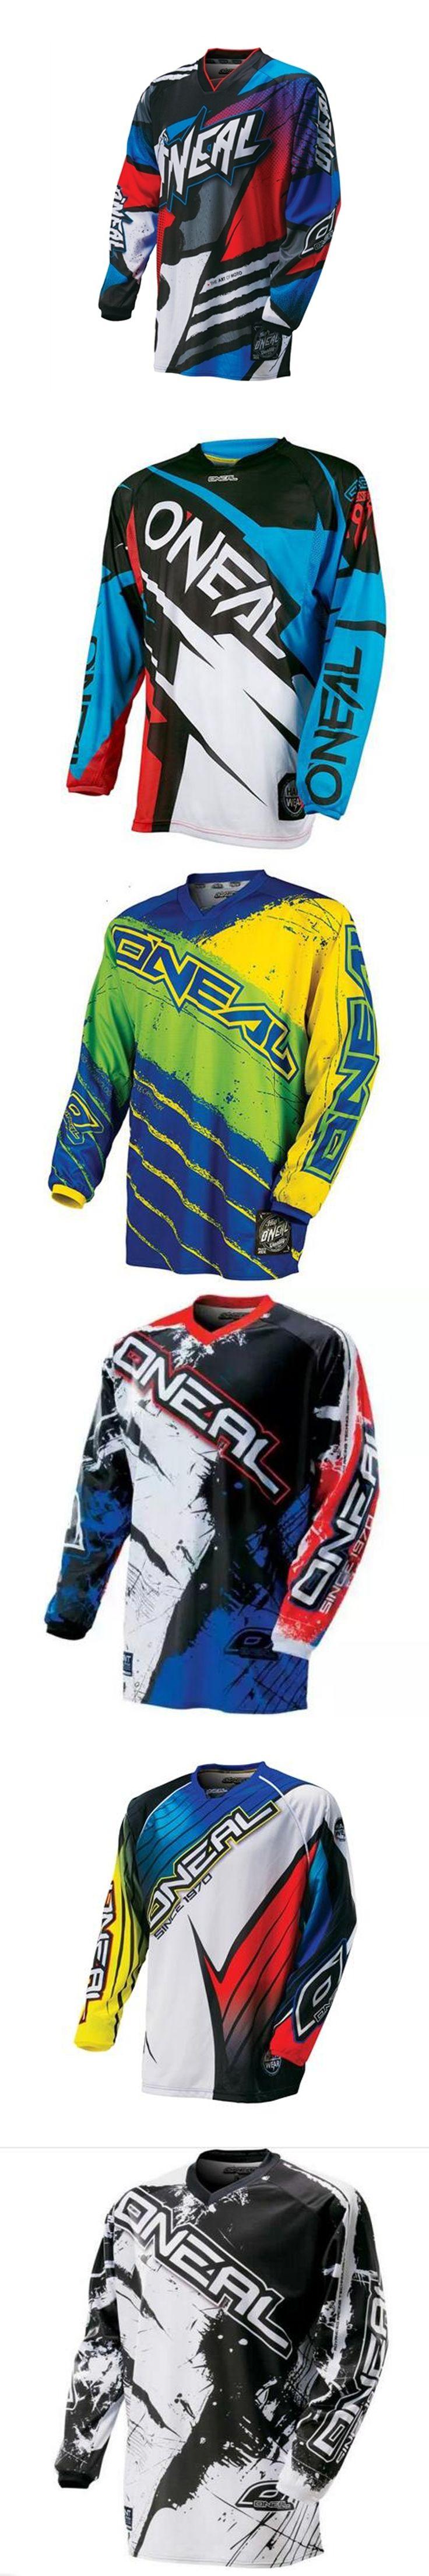 2017 New Mountain Downhill Bike Racing Off-road Motocross Jersey Men Long Sleeve Cycling Jersey Motorbike Shirts Clearance Sales